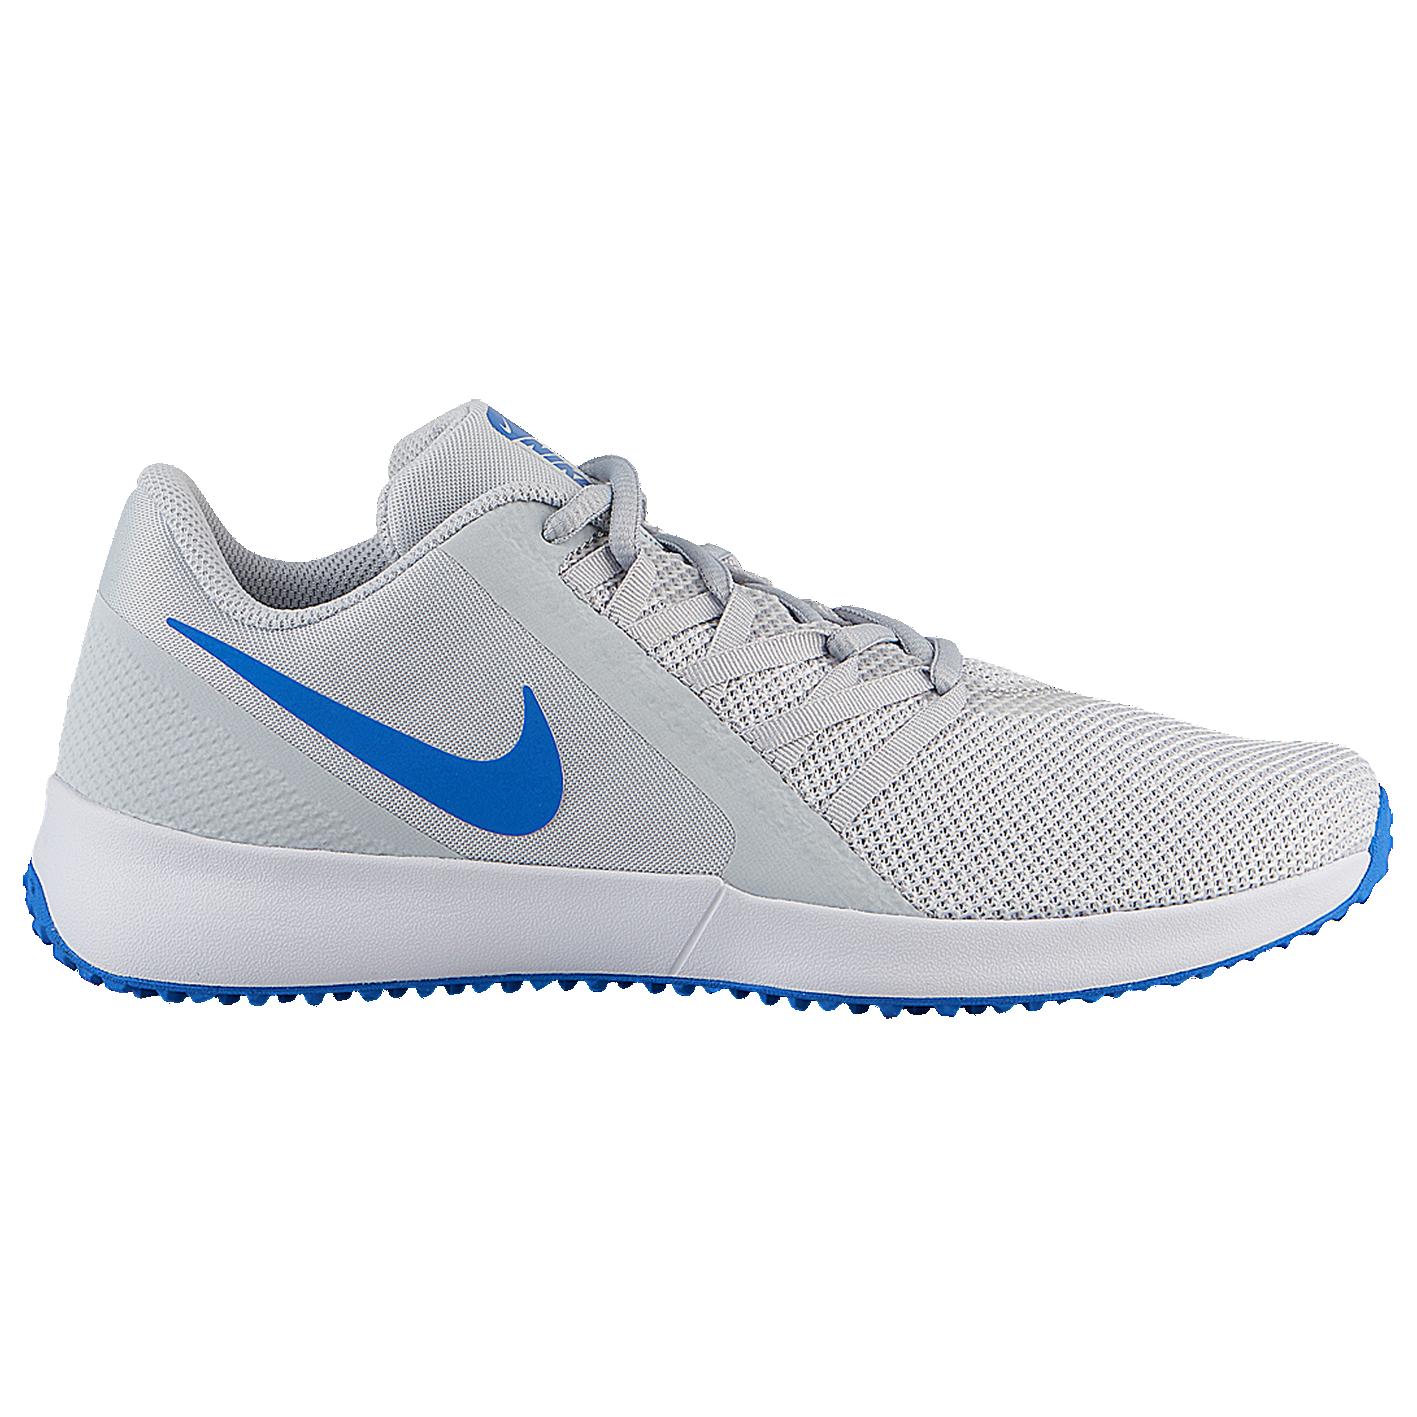 separation shoes d4ade c2175 Nike Varsity Compete Trainer - Men s